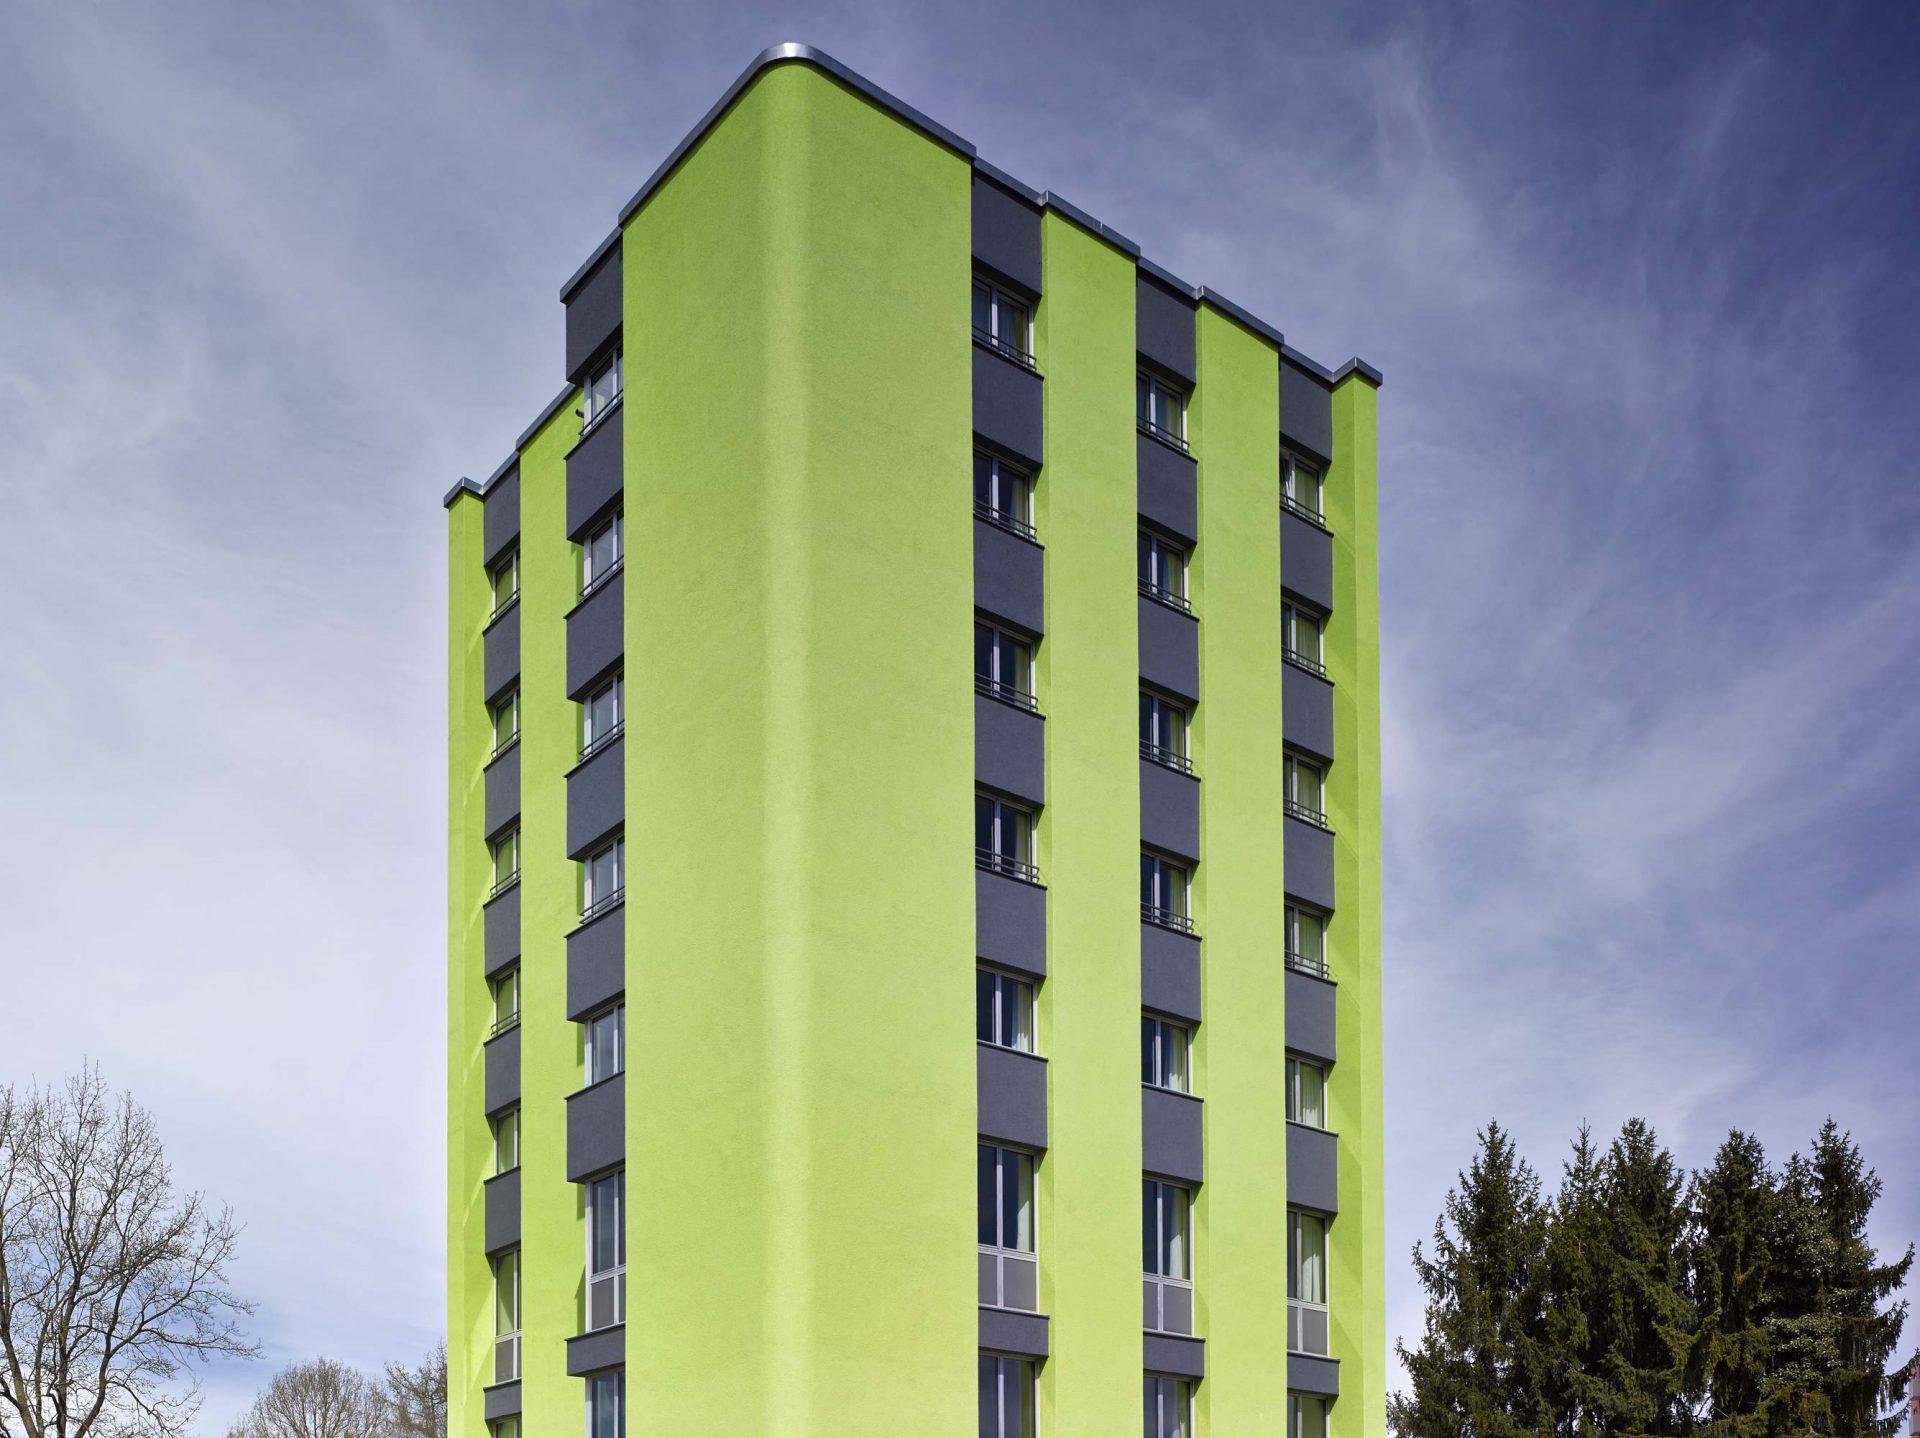 GreenHouse-150415-0165-01